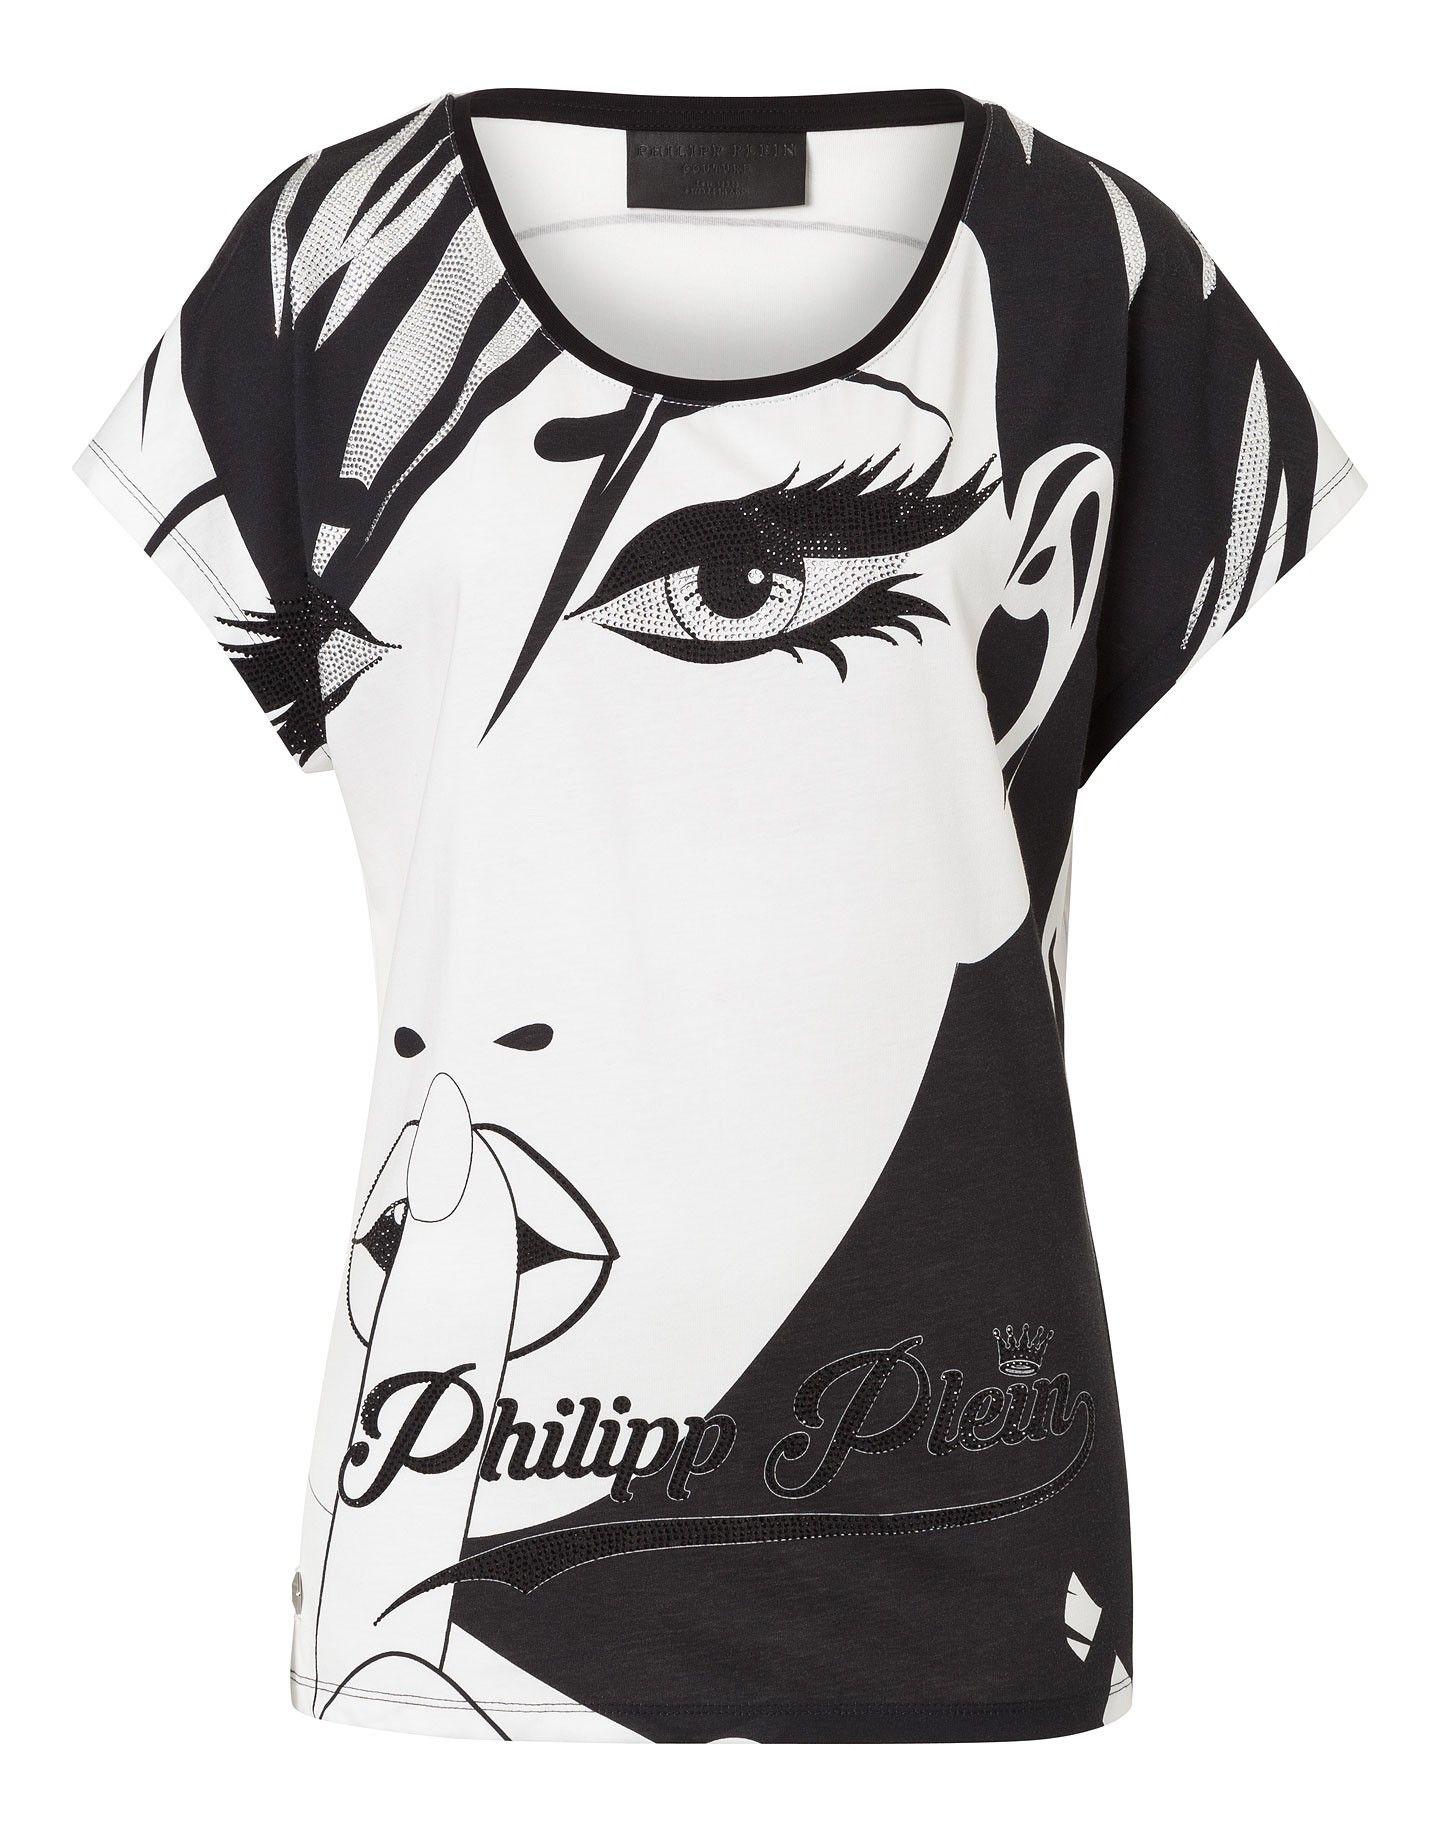 "PHILIPP PLEIN T-SHIRT ""FACE"". #philippplein #cloth #"